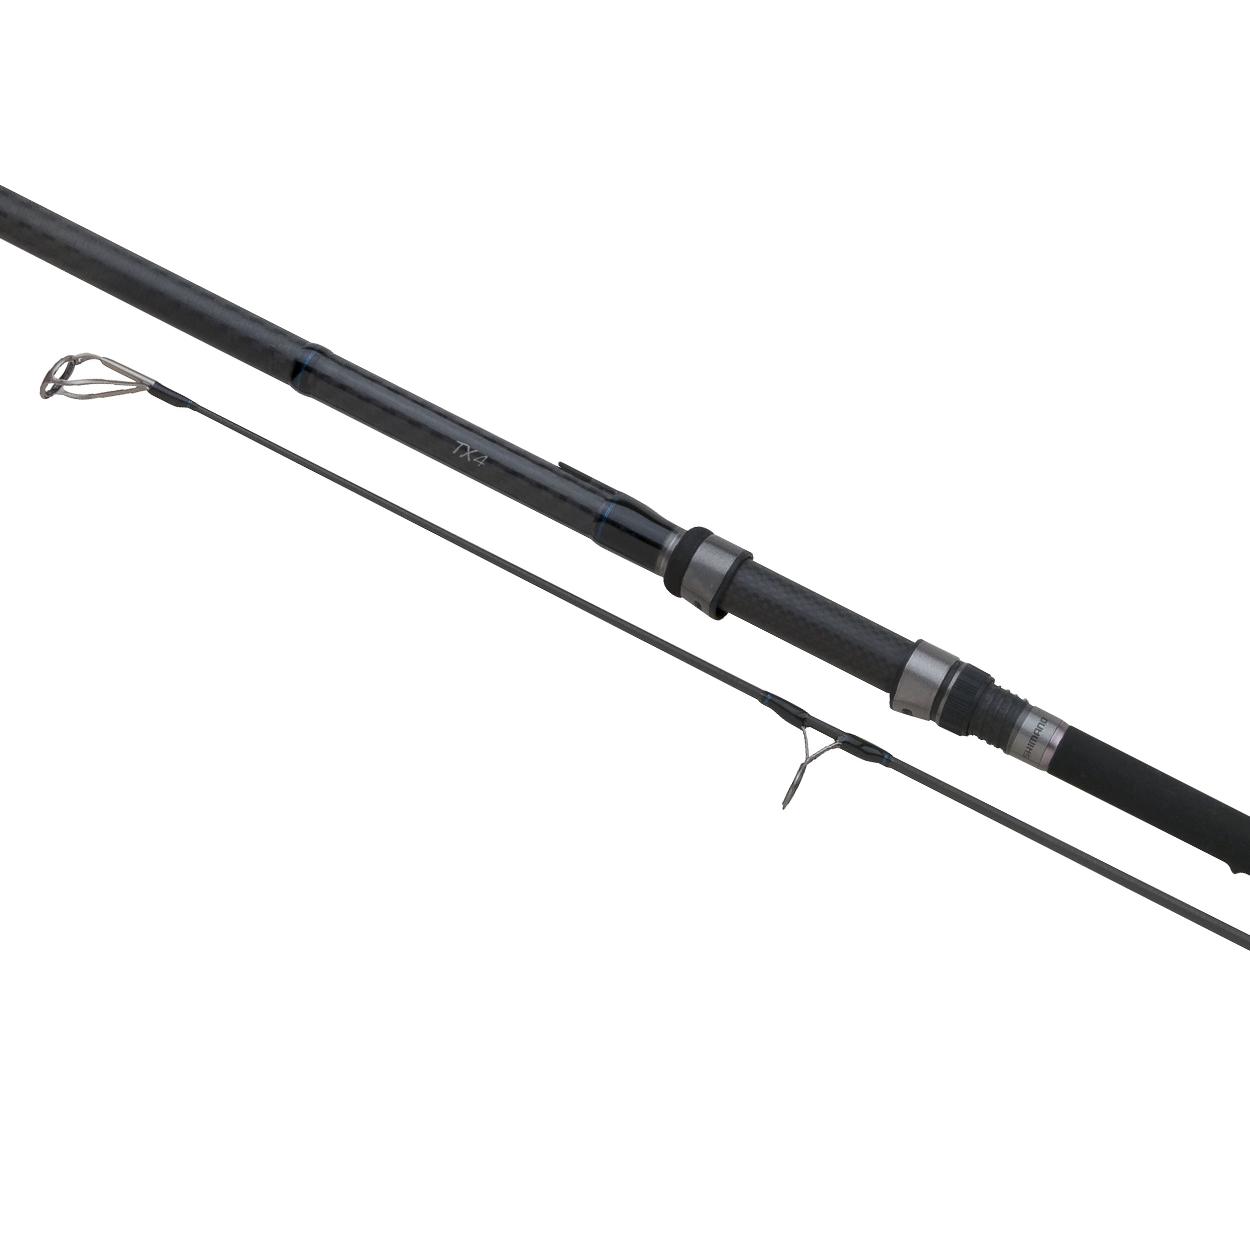 цена на Удилище карповое SHIMANO TRIBAL TX-4 12 INTENSITY (+ Леска в подарок!)